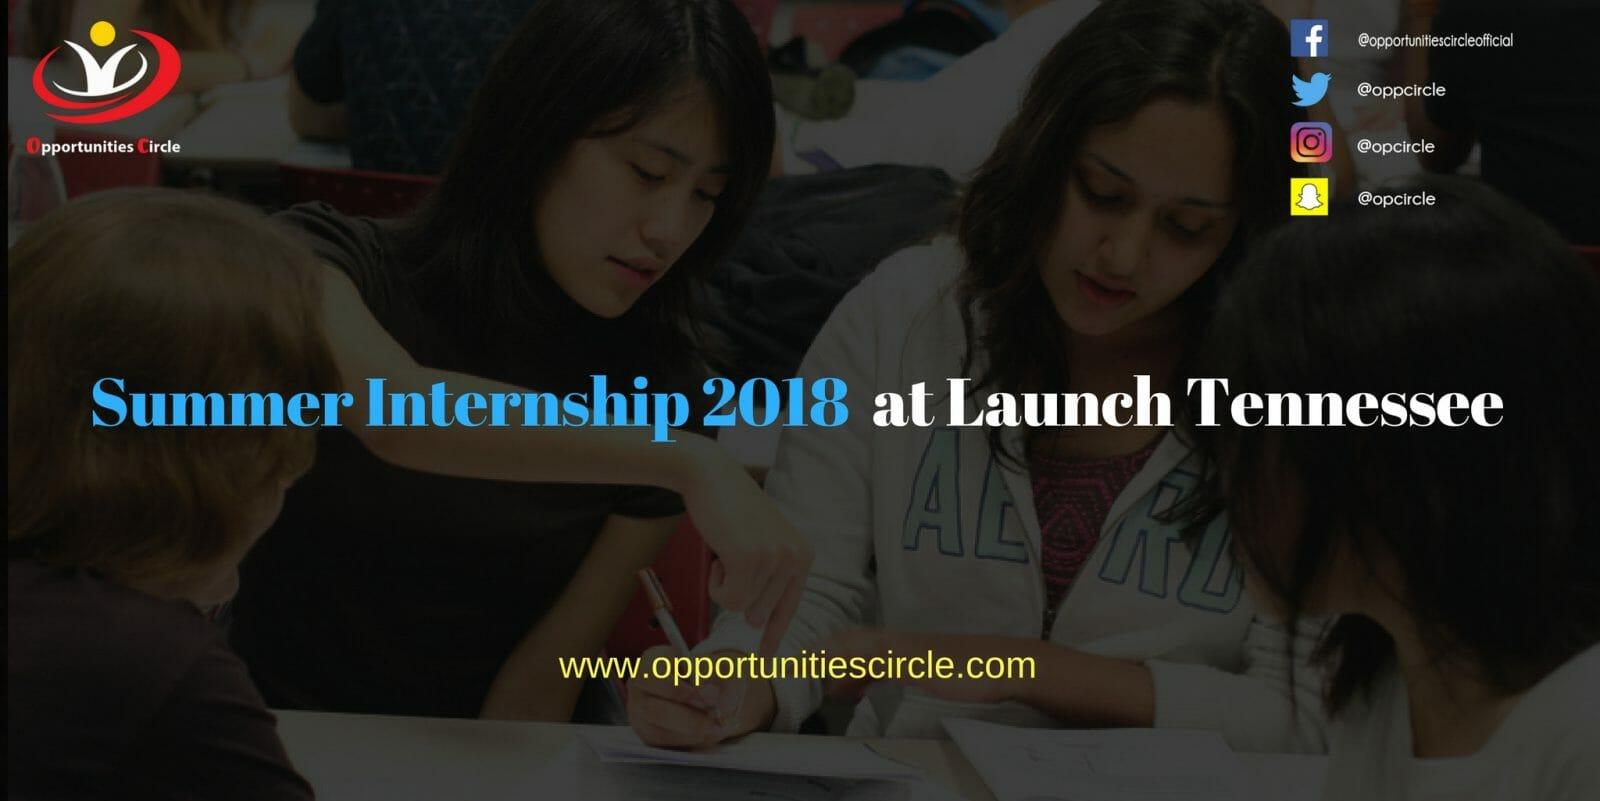 Summer Internship 2018 at Launch Tennessee - Summer Internship 2018  at Launch Tennessee